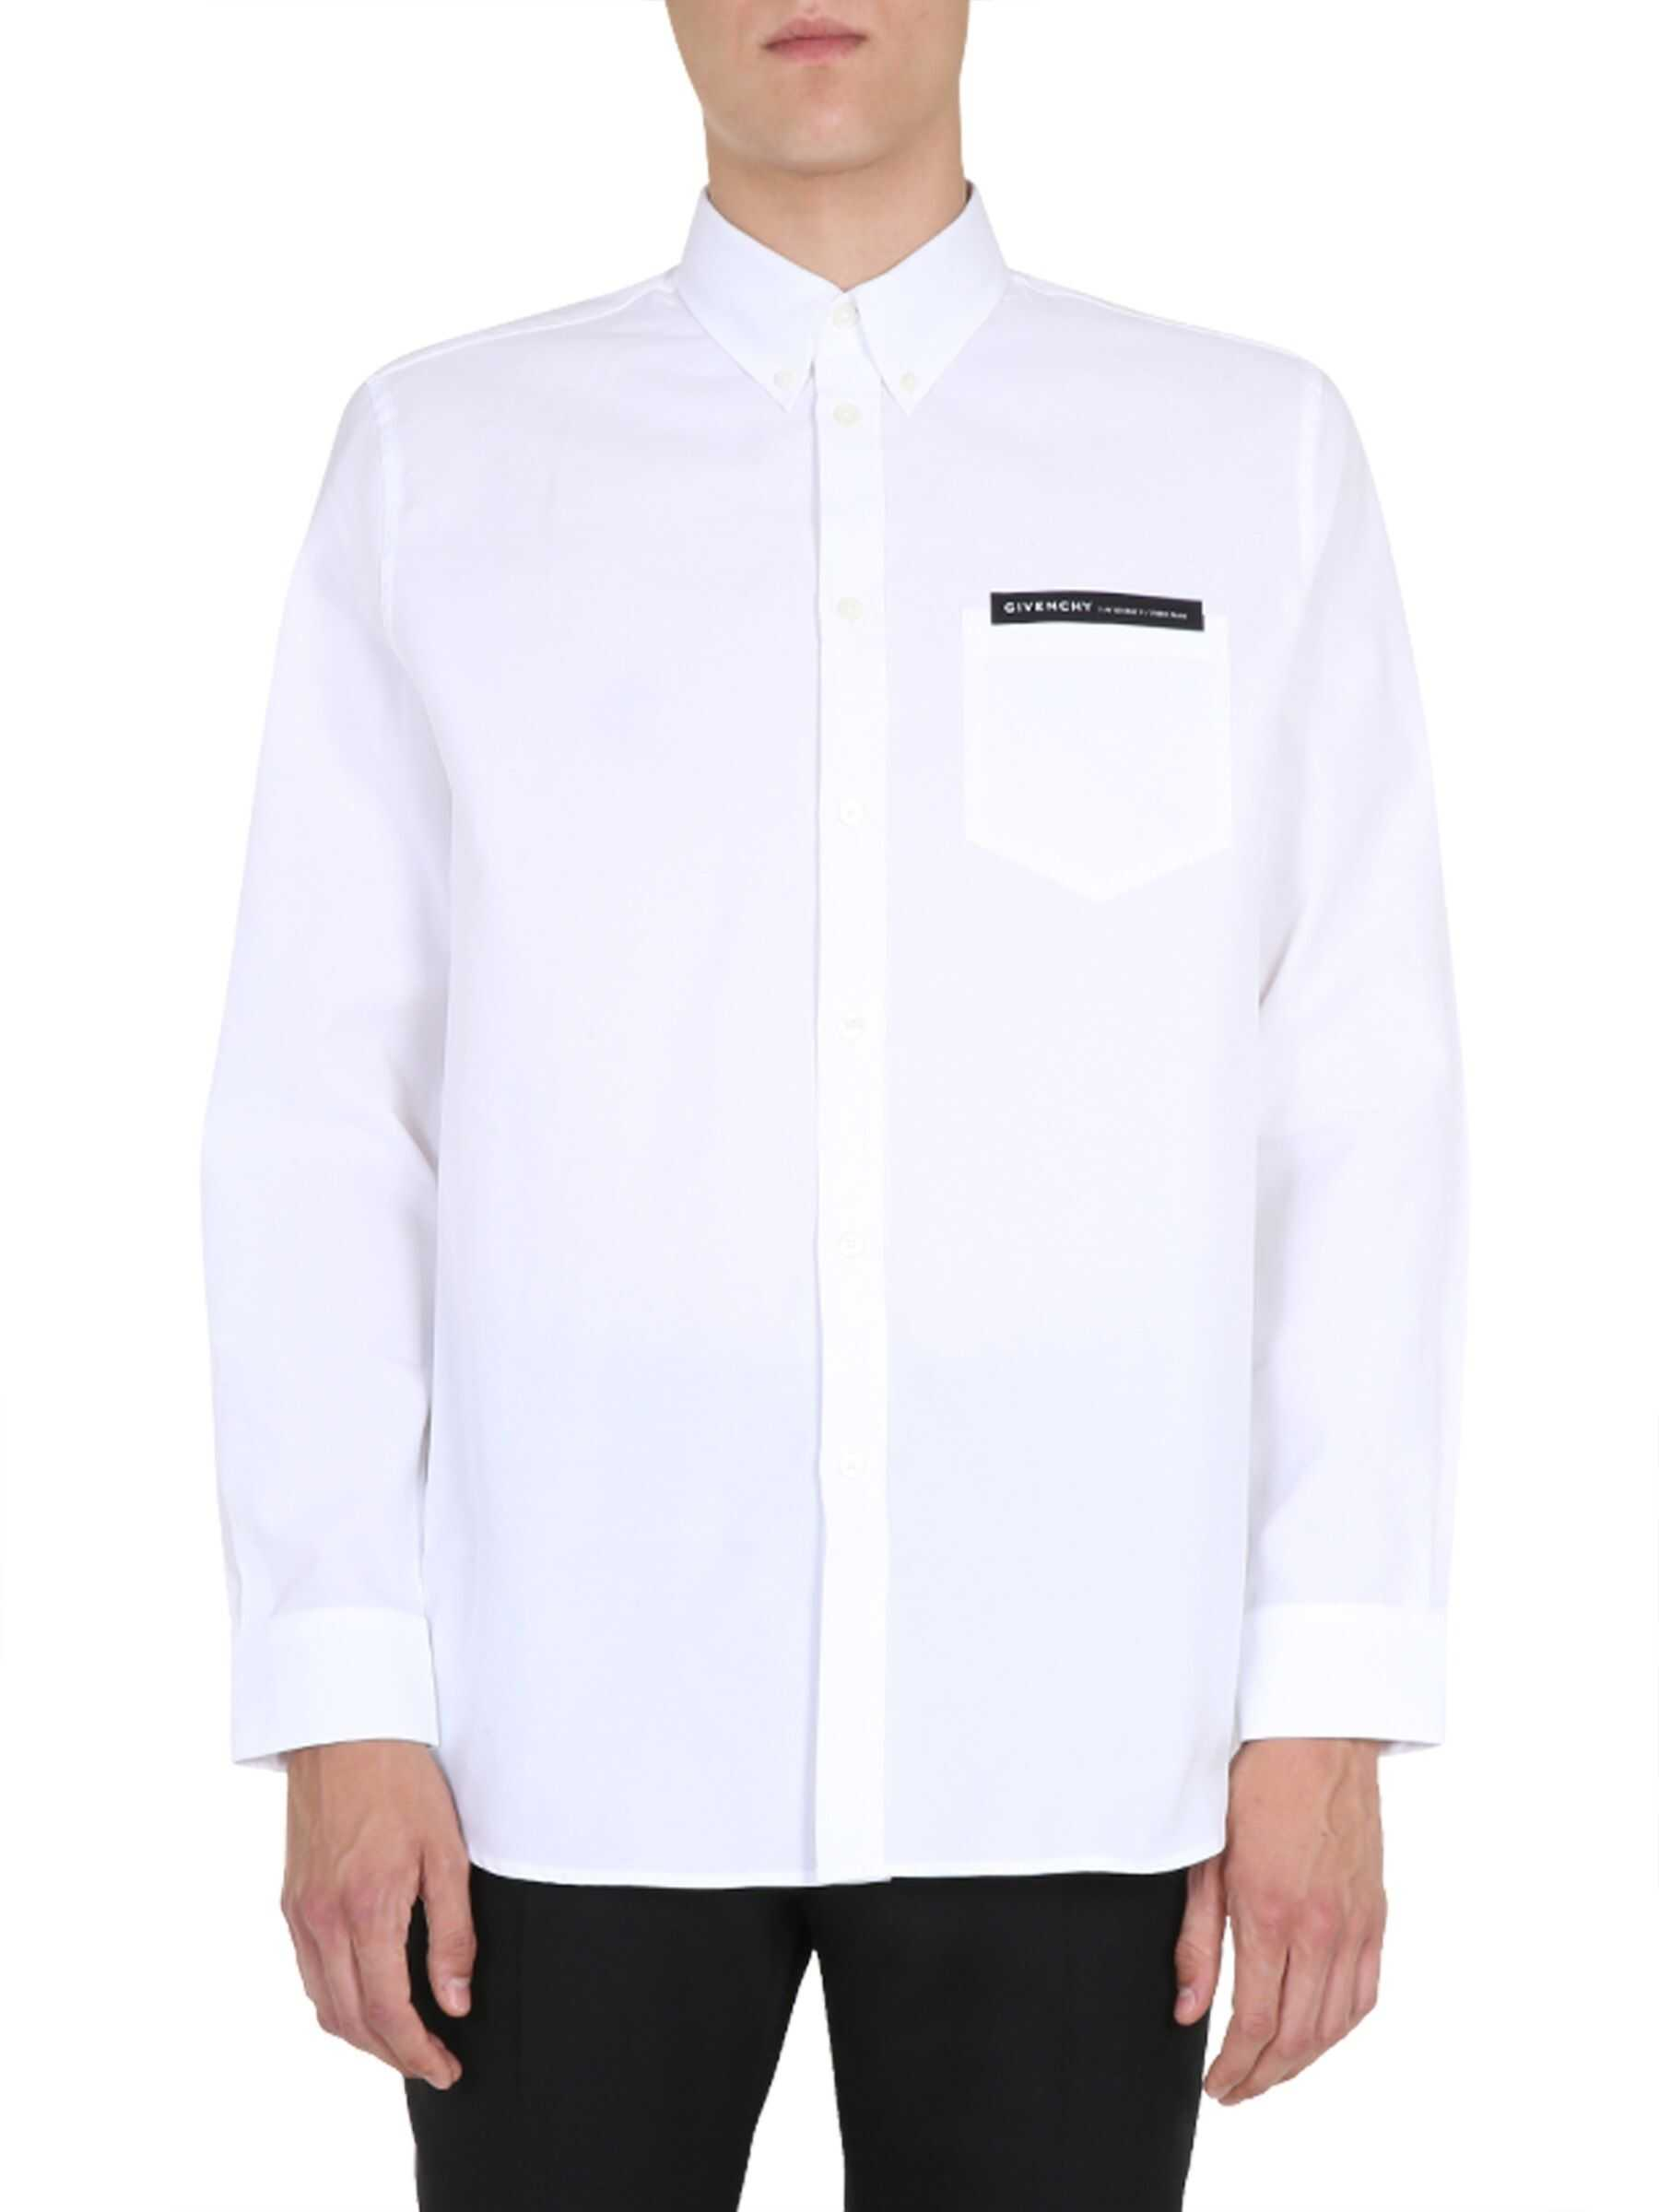 Givenchy Button Down Shirt WHITE imagine